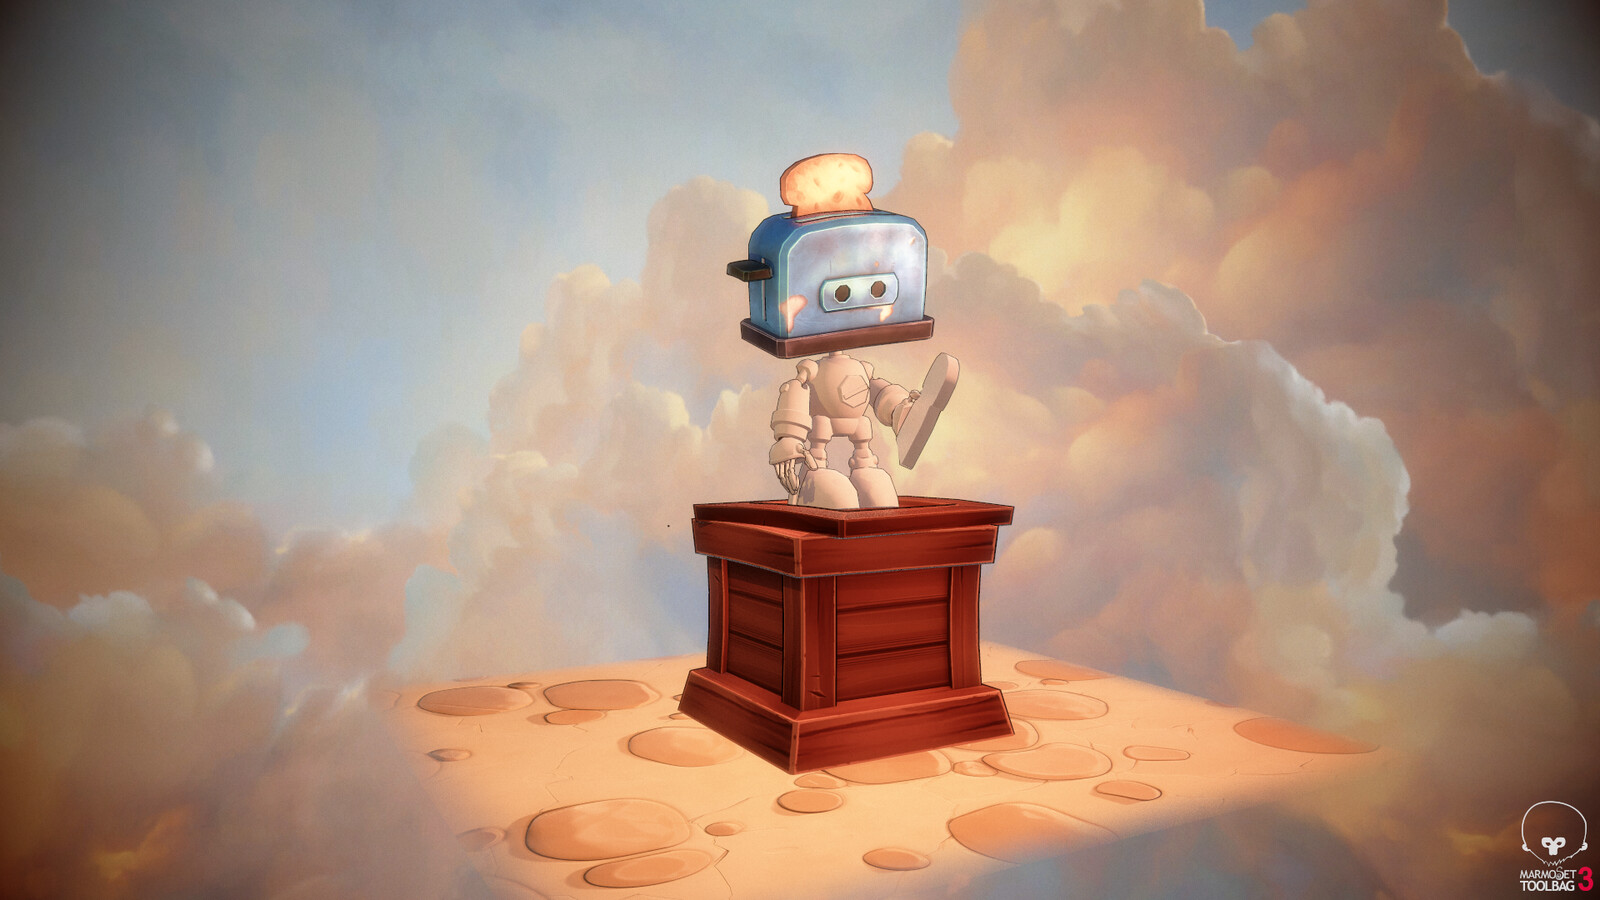 Toaster Robot // work in progress